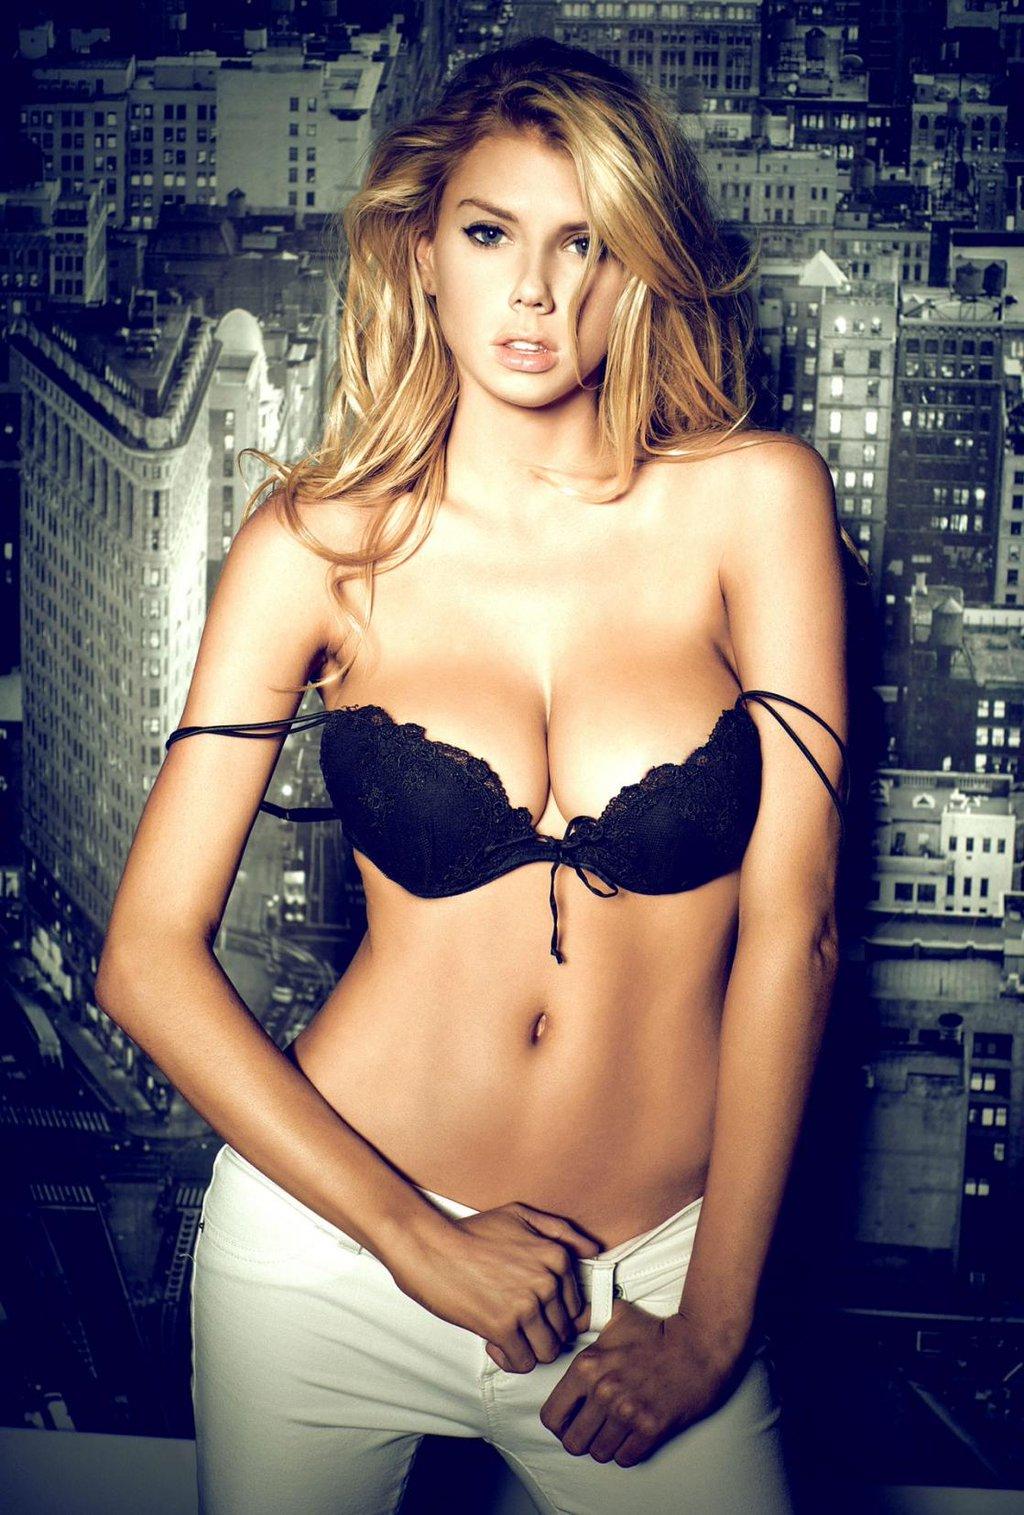 People 1024x1515 women model blonde long hair Charlotte McKinney belly lingerie black bras portrait display poster